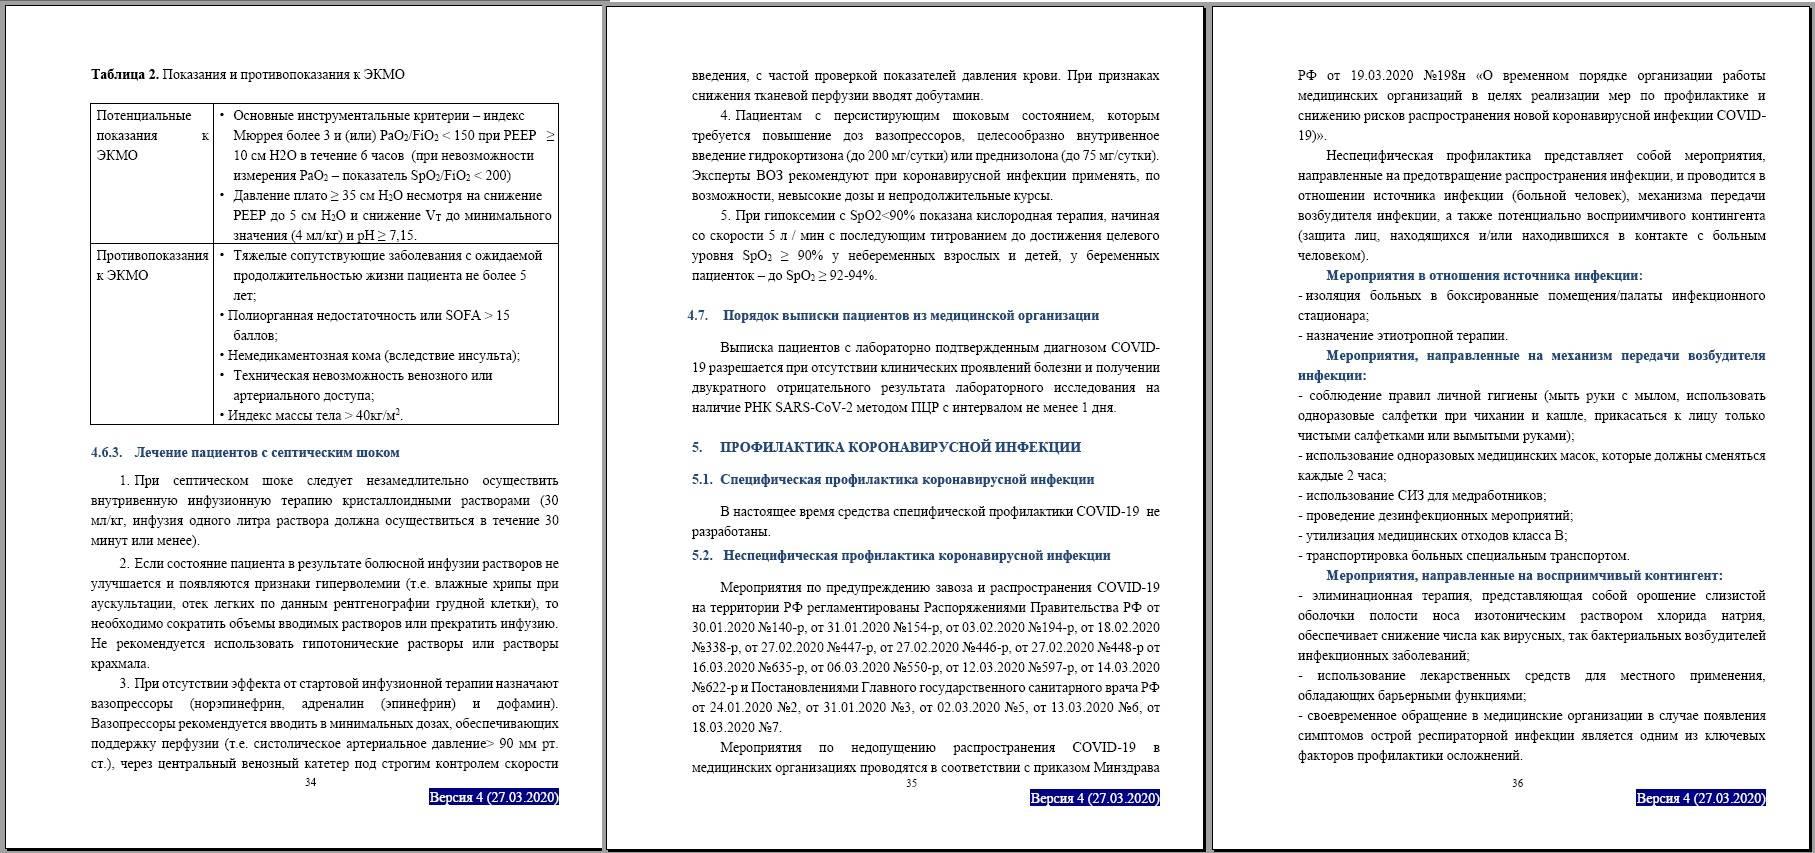 Минздрав России обновил рекомендации по лечению Covid-19